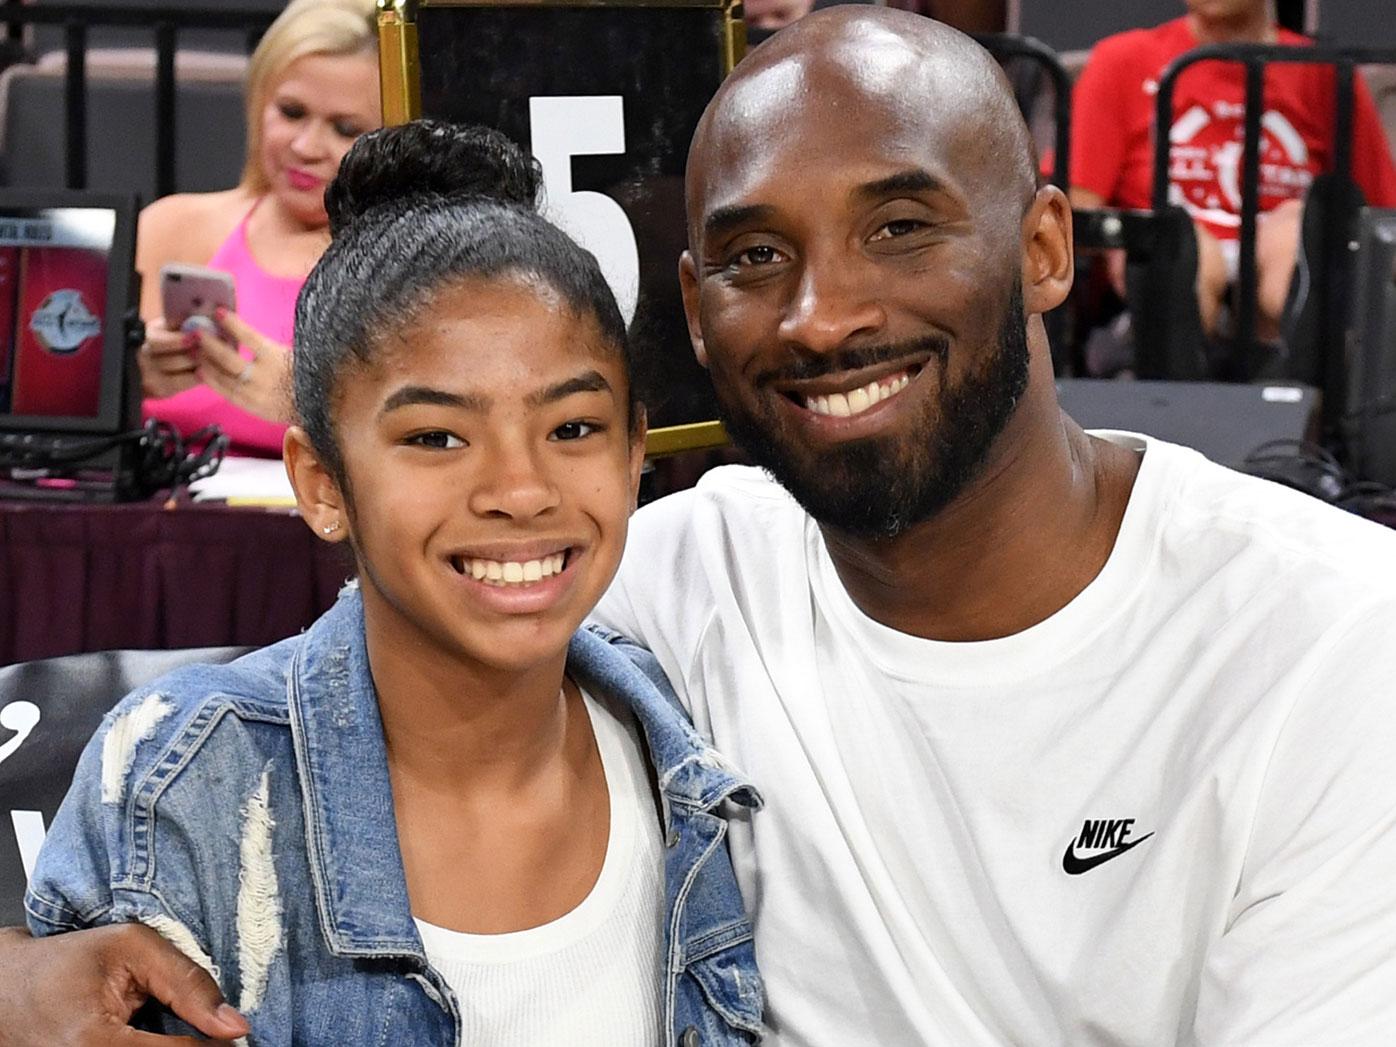 Vanessa Bryant posts heartfelt tributes to Kobe, Gianna: 'Miss you so much'